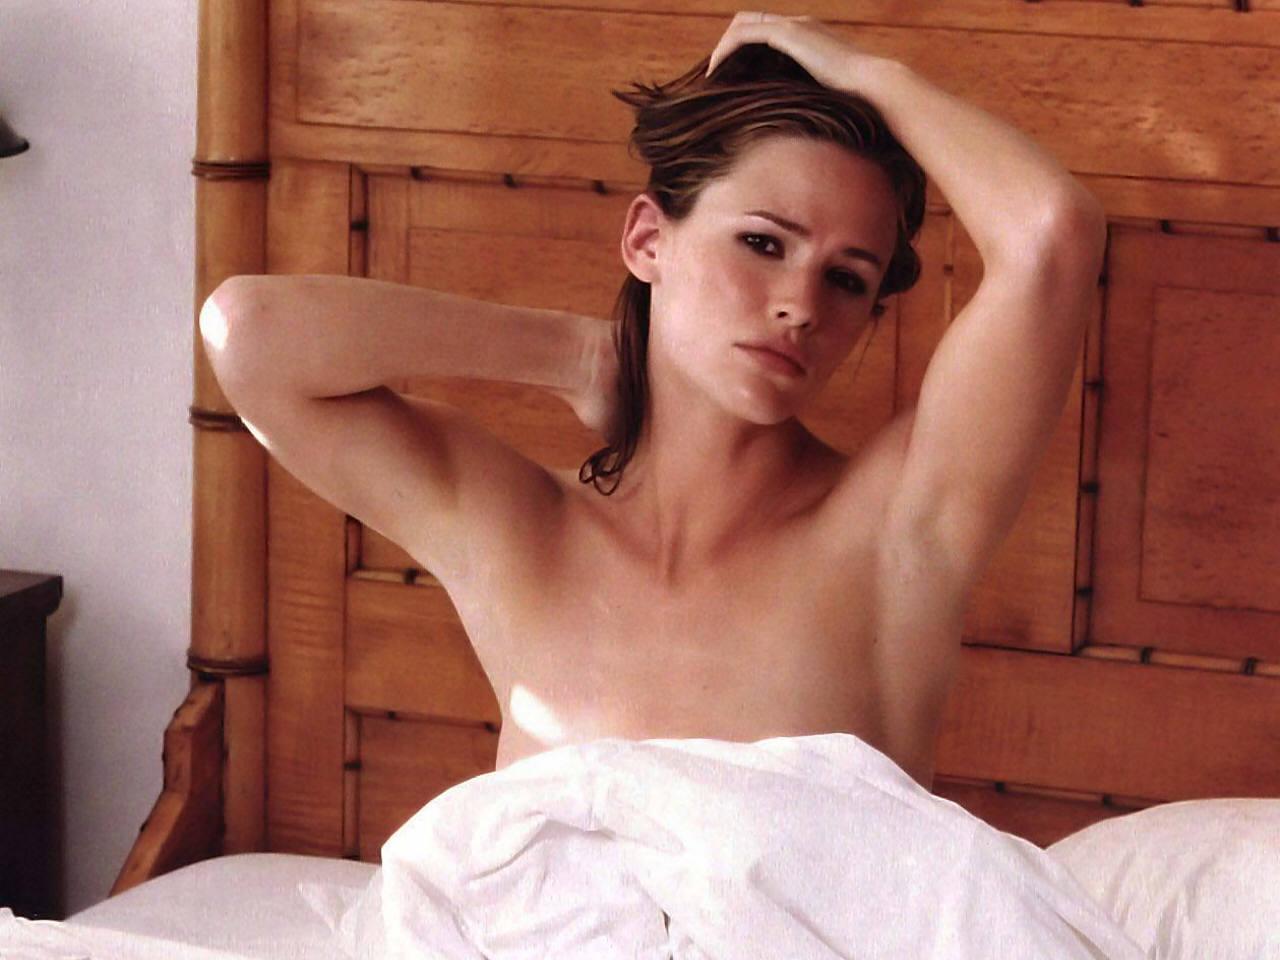 Hermosa actriz caliente jennifer garner sexy pin